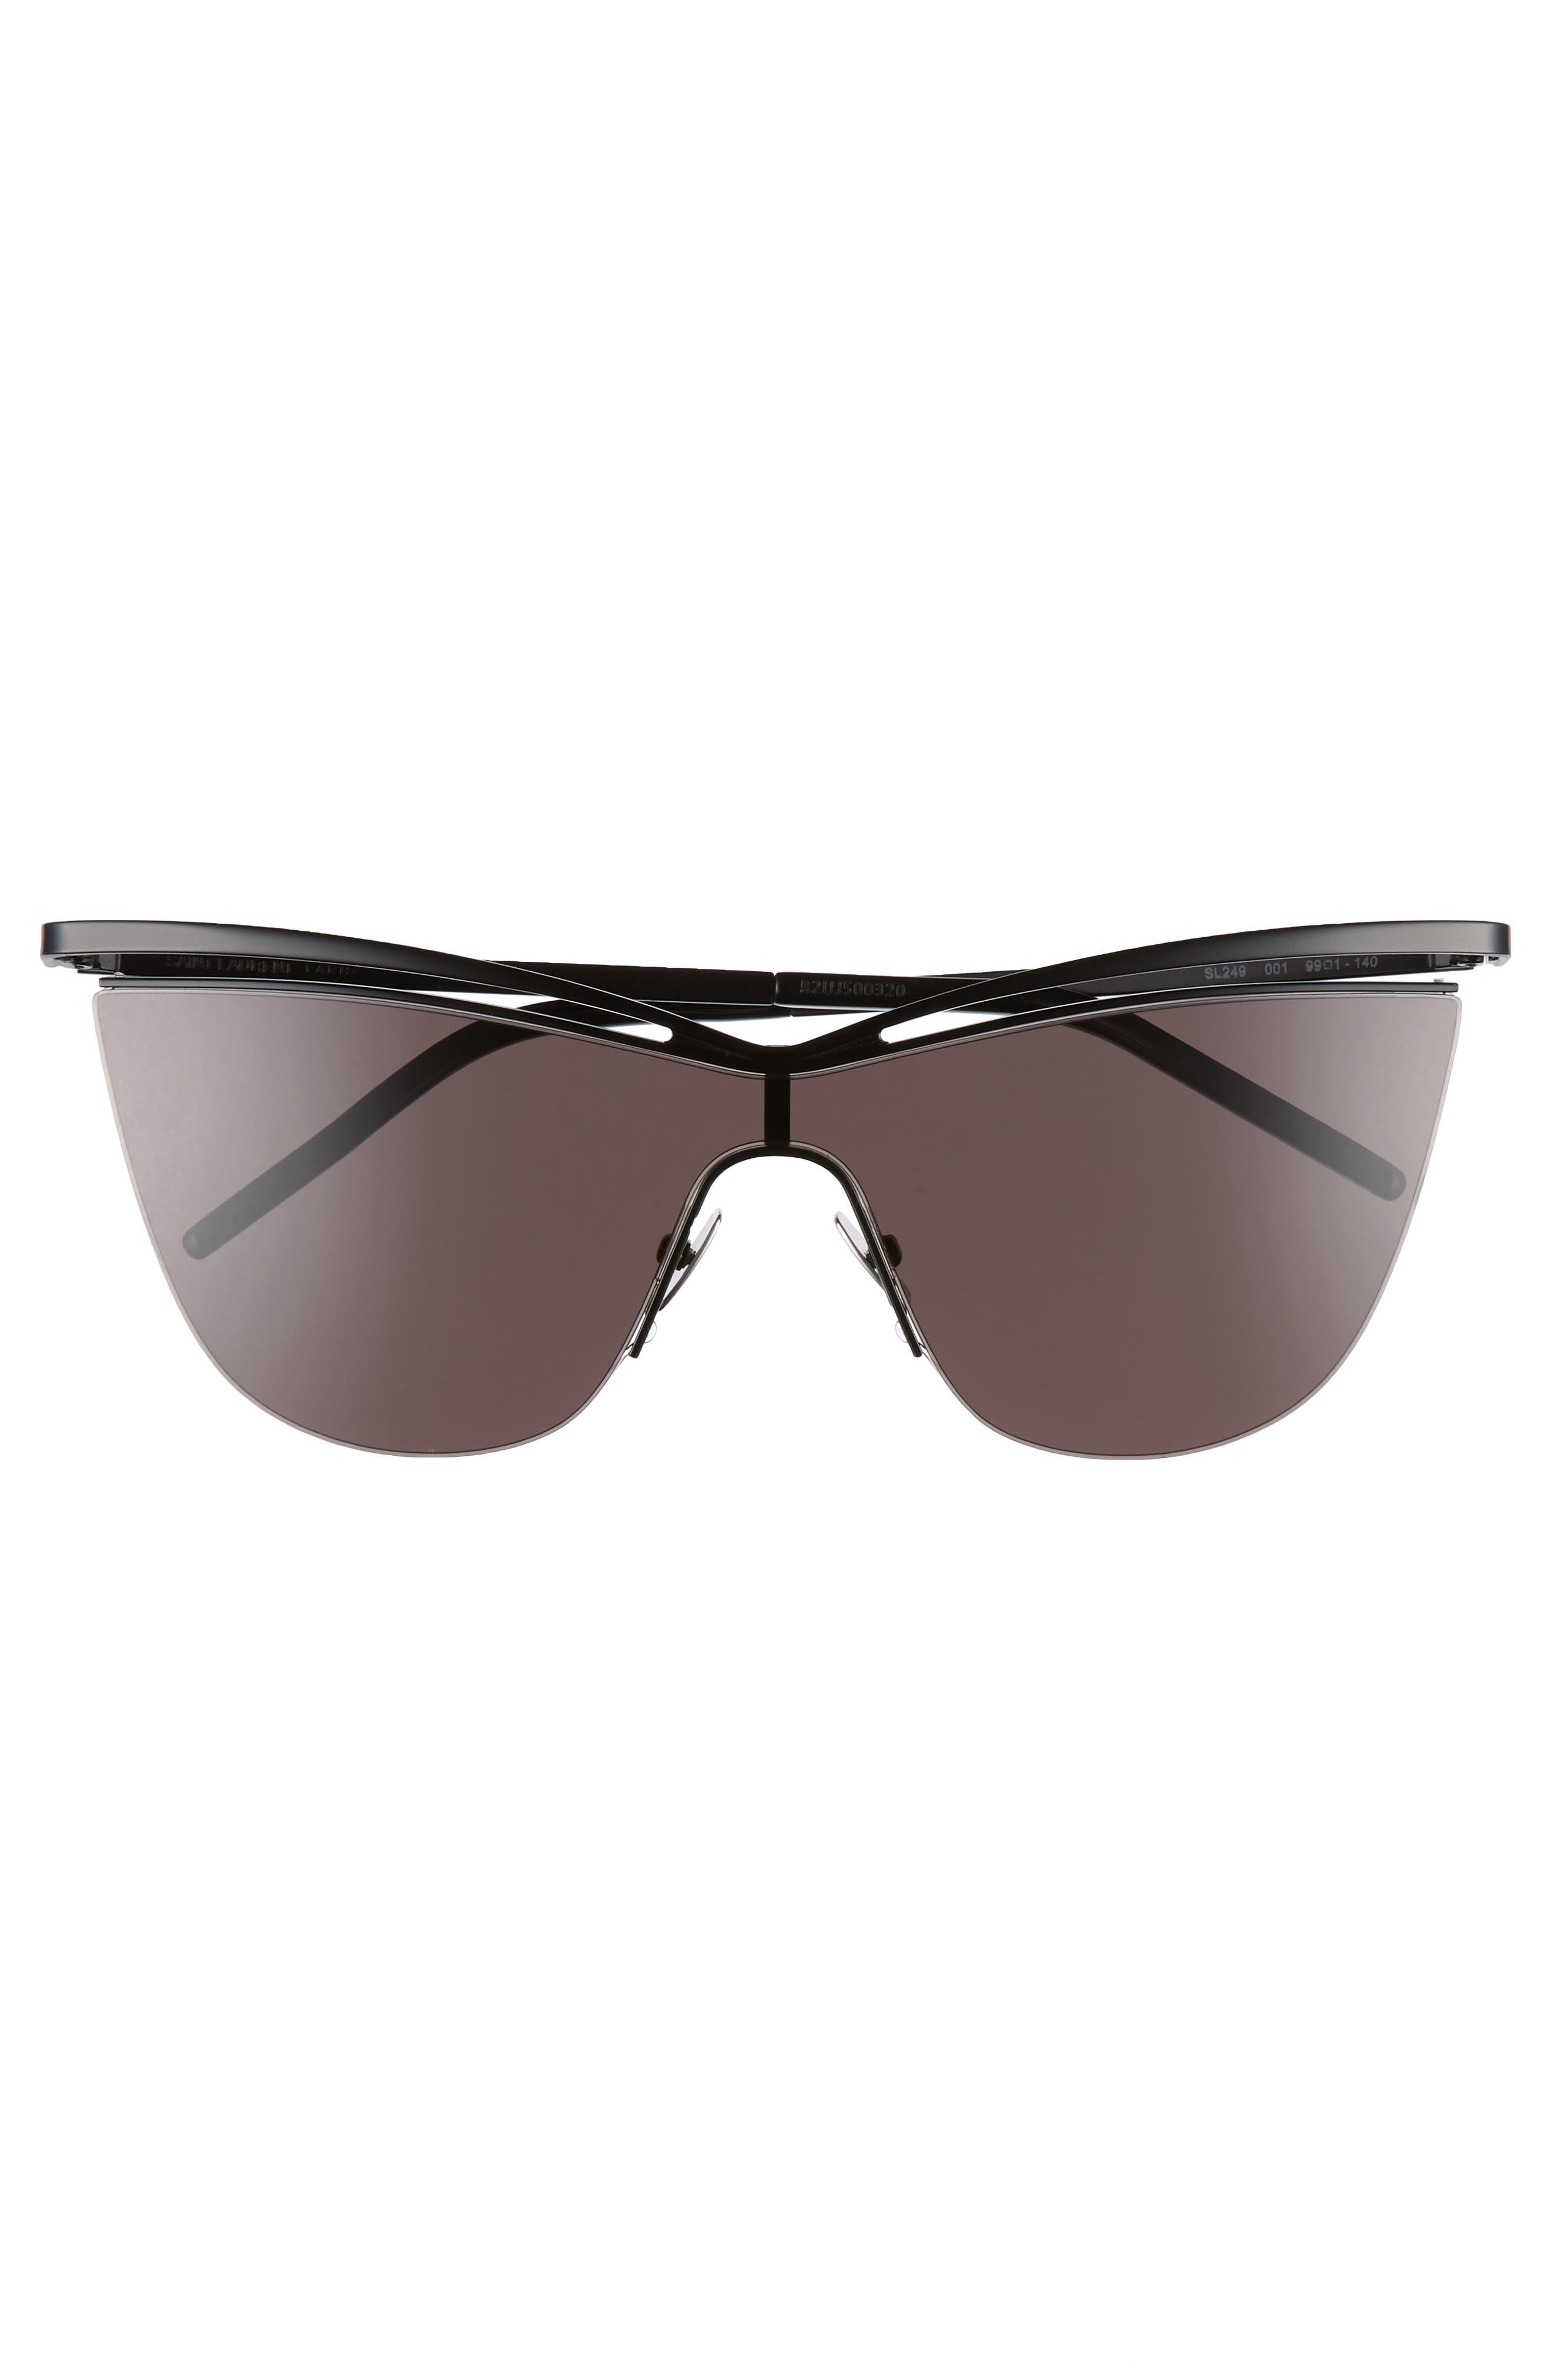 134mm Cat Eye Shield Sunglasses,                             Alternate thumbnail 3, color,                             BLACK/ BLACK